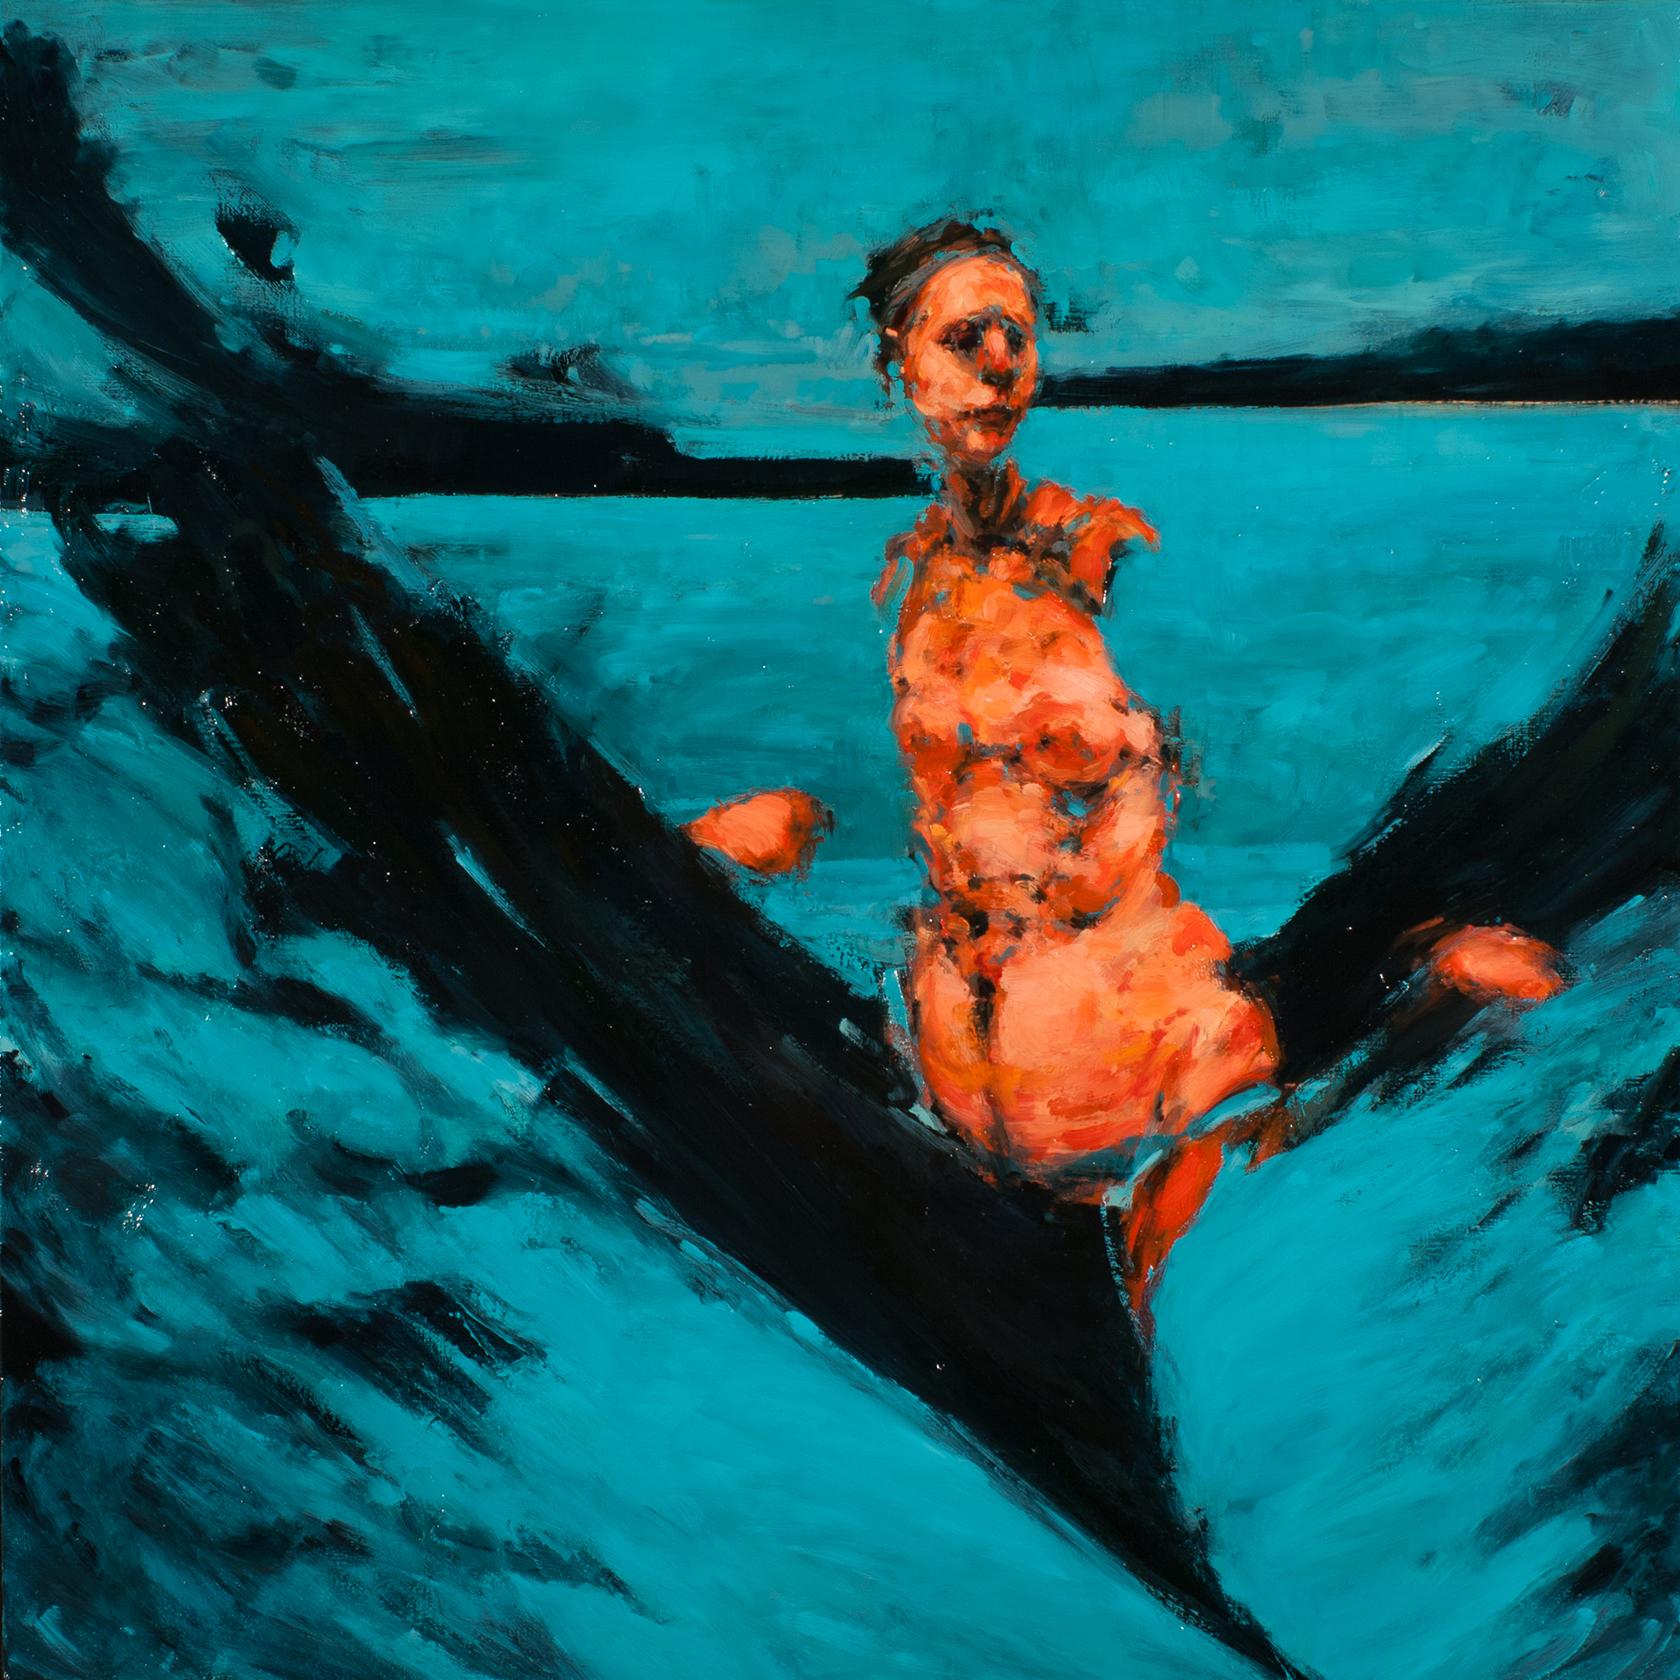 "Watchers, oil on canvas, 32"" x 32"" x 2"", 2012"